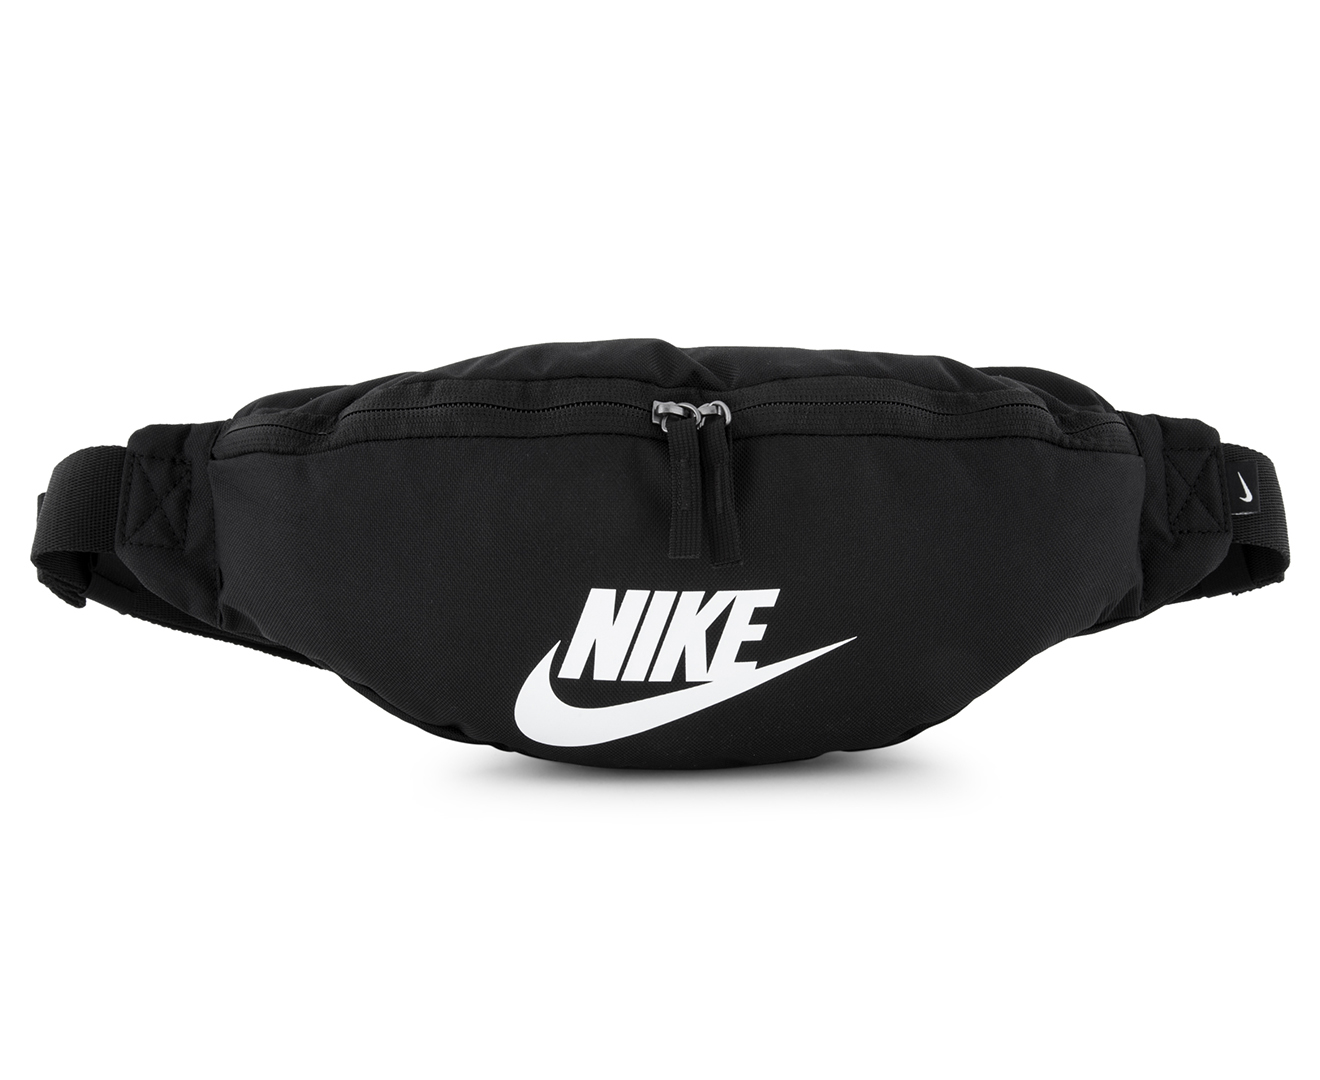 5d2bf8be27bc Nike Heritage Hip Pack - Black